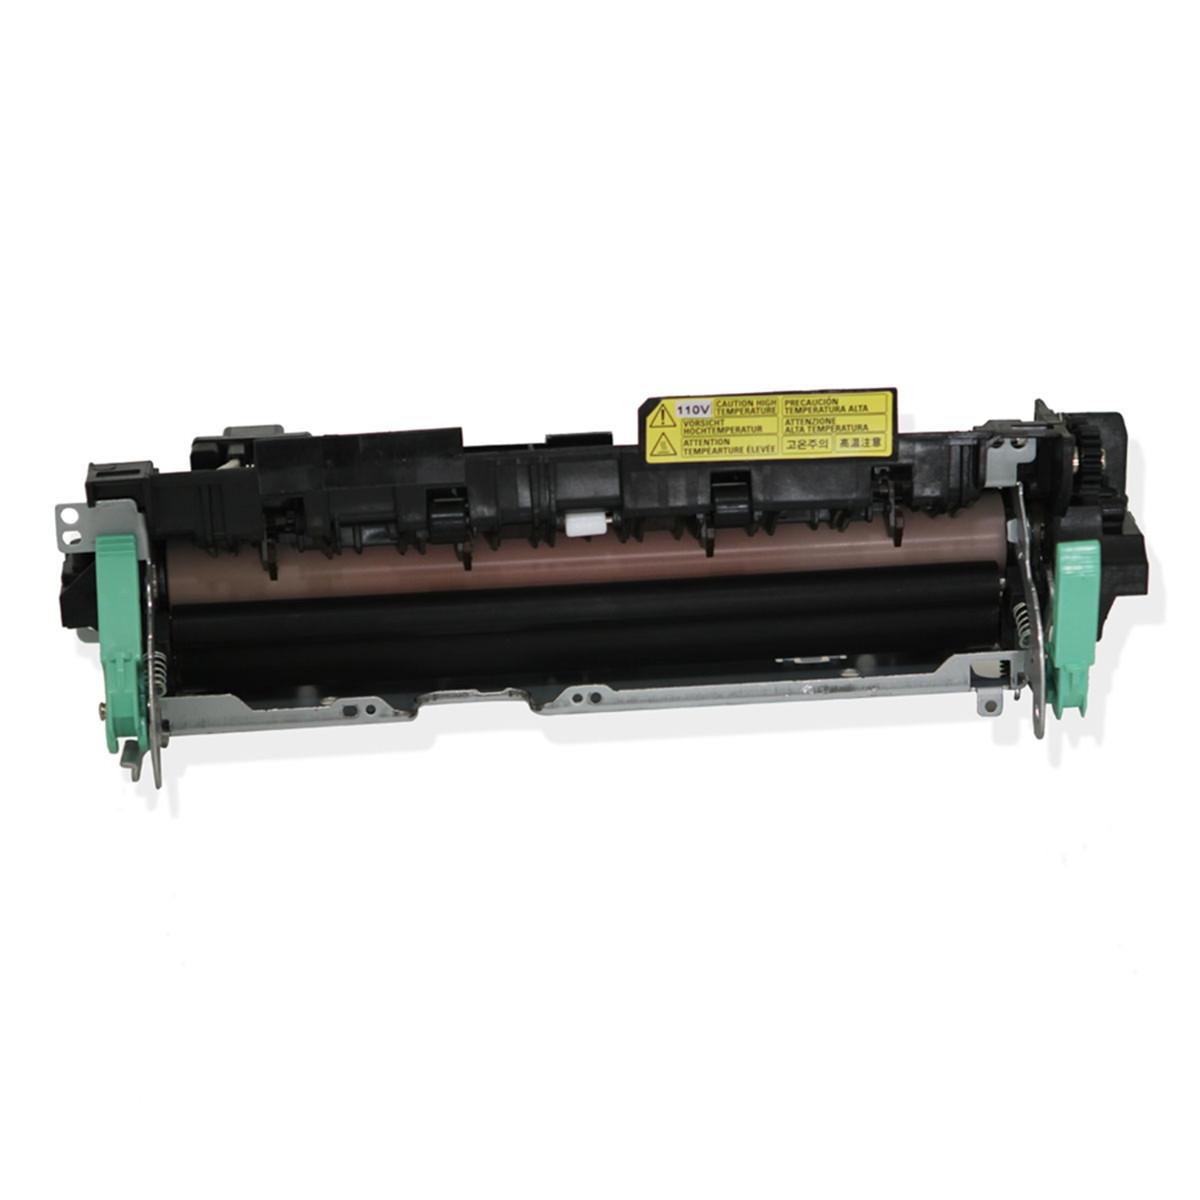 Unidade Fusora Samsung SCX5637 SCX4833 ML4070 M4070FR ML3310 ML3312ND M4080   JC91-01023A   Original